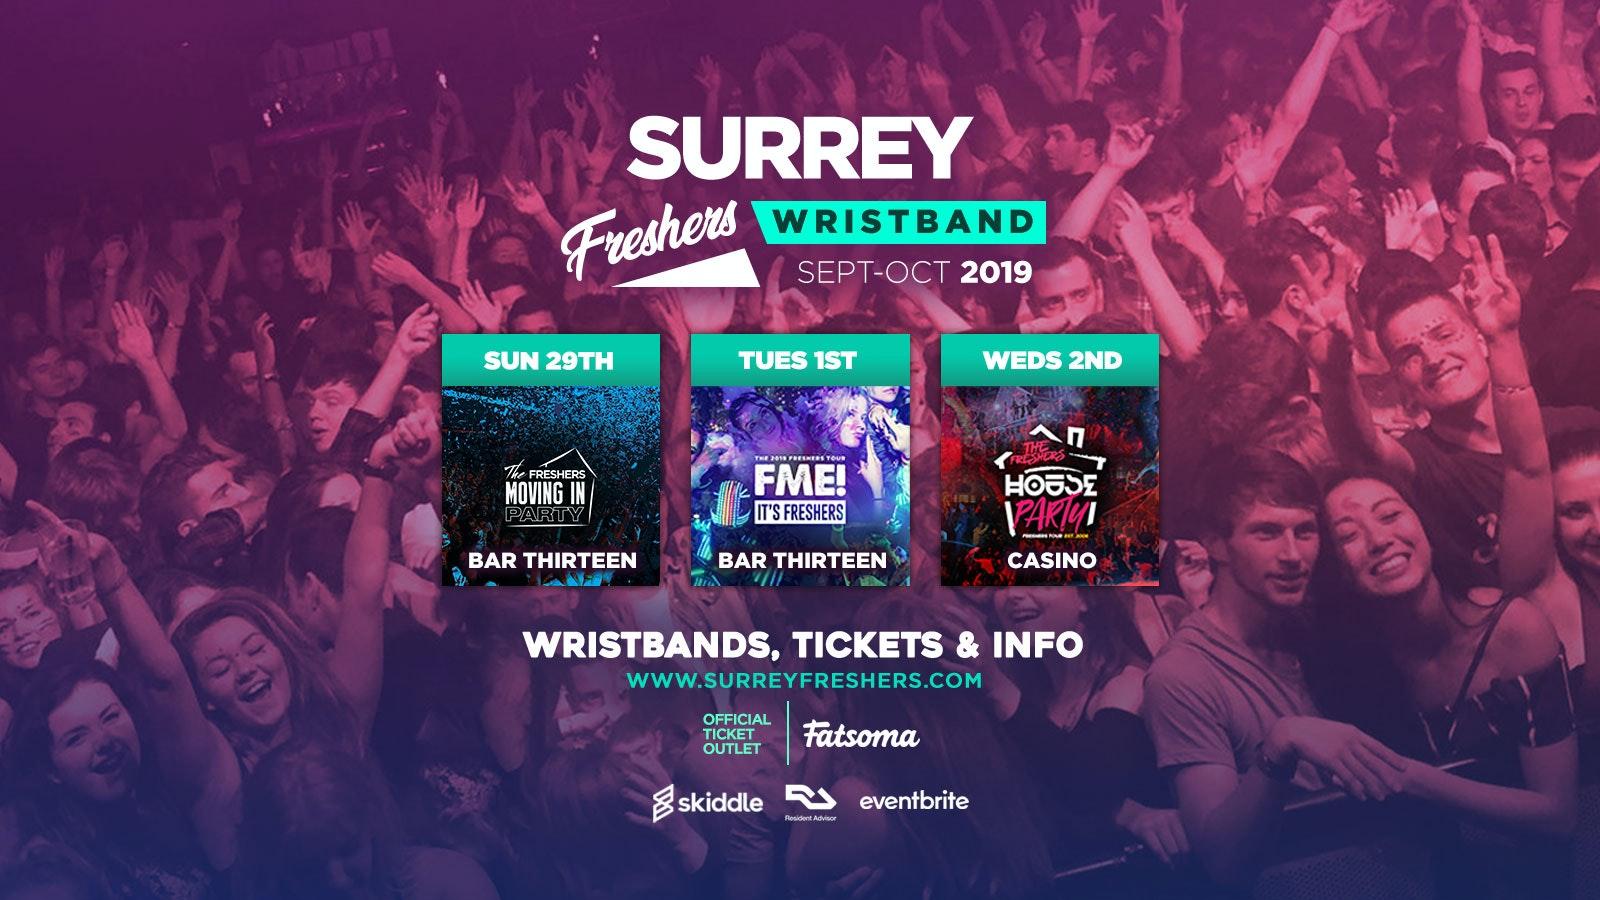 Surrey Freshers Wristband 2019 (Guildford) ///